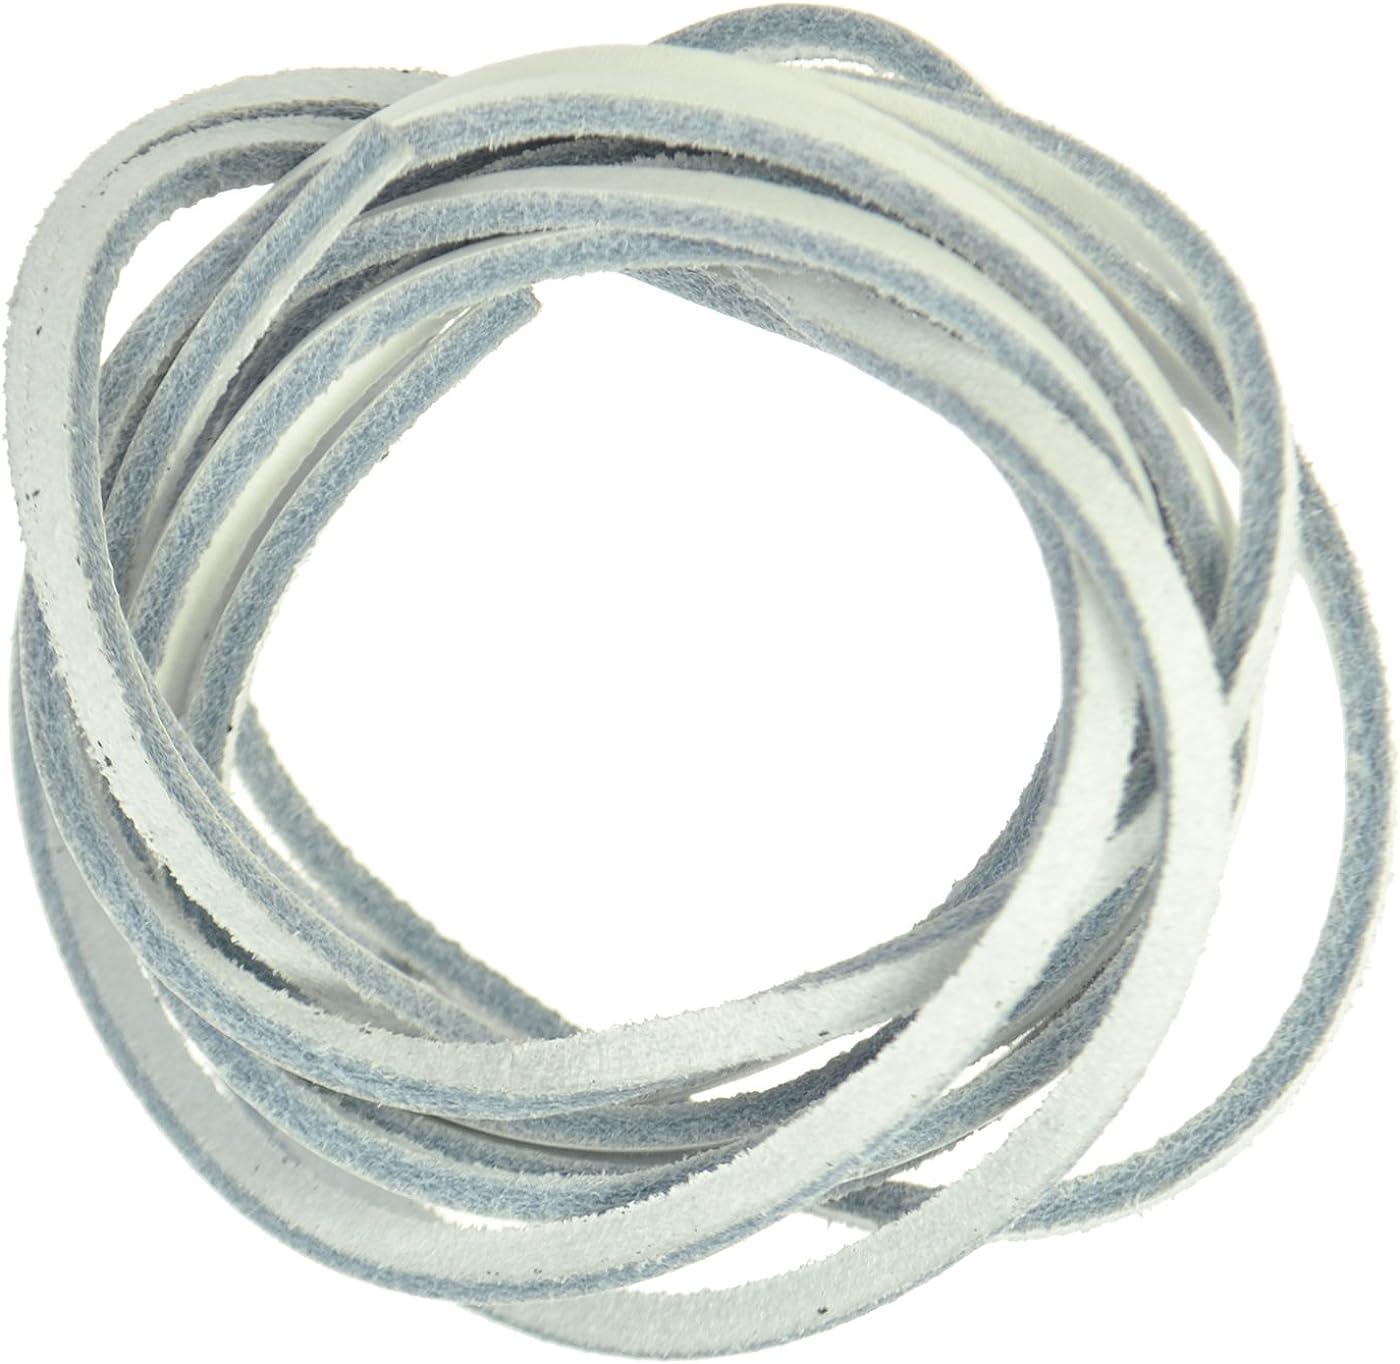 Leather Shoe Laces - White: Amazon.co